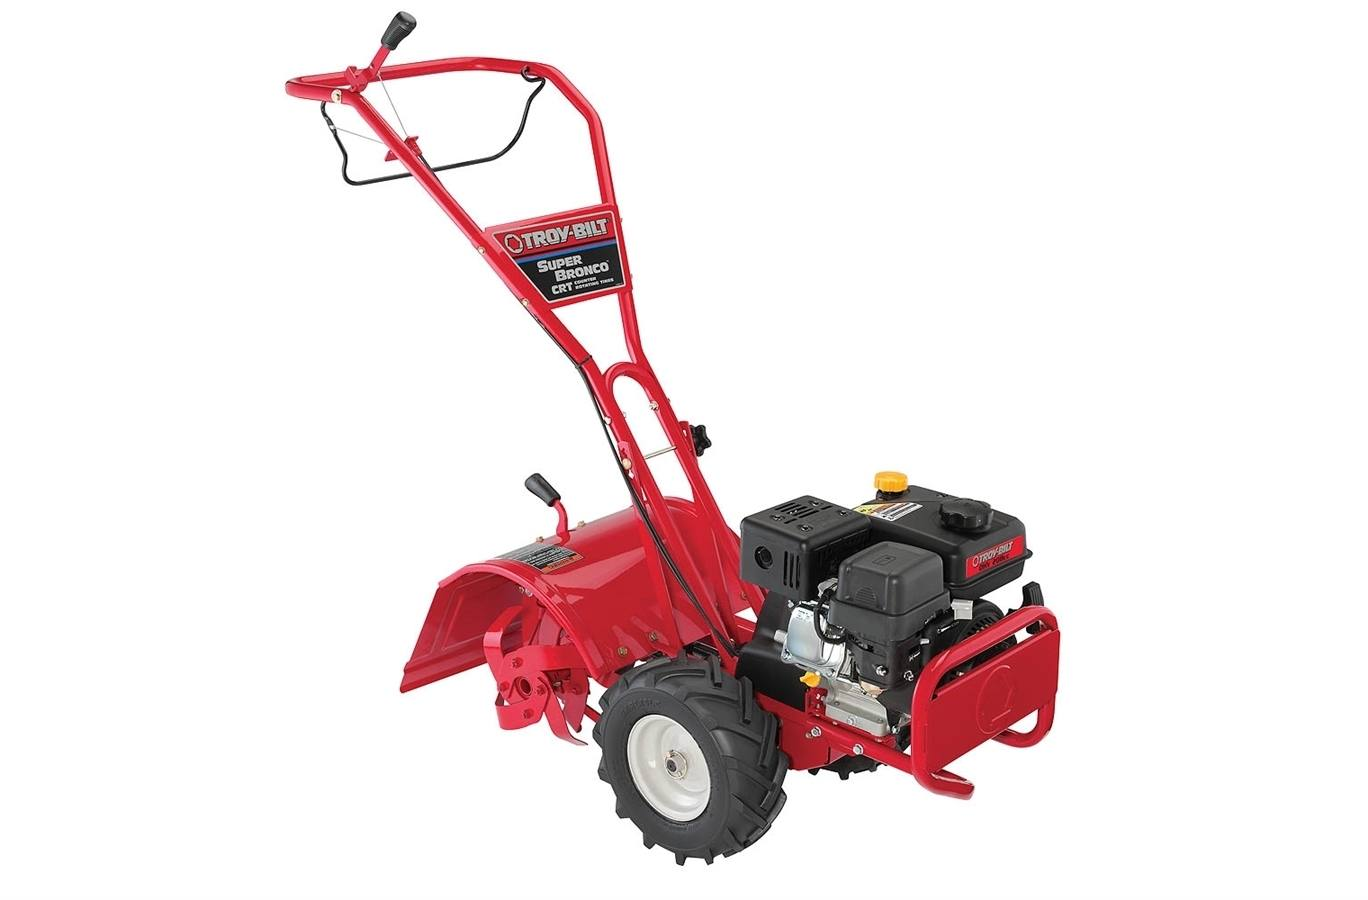 2017 Troy Bilt Bronco Crt Garden Tiller For Sale In Kalamazoo Mi Horse Lawn Tractor Wiring Diagram